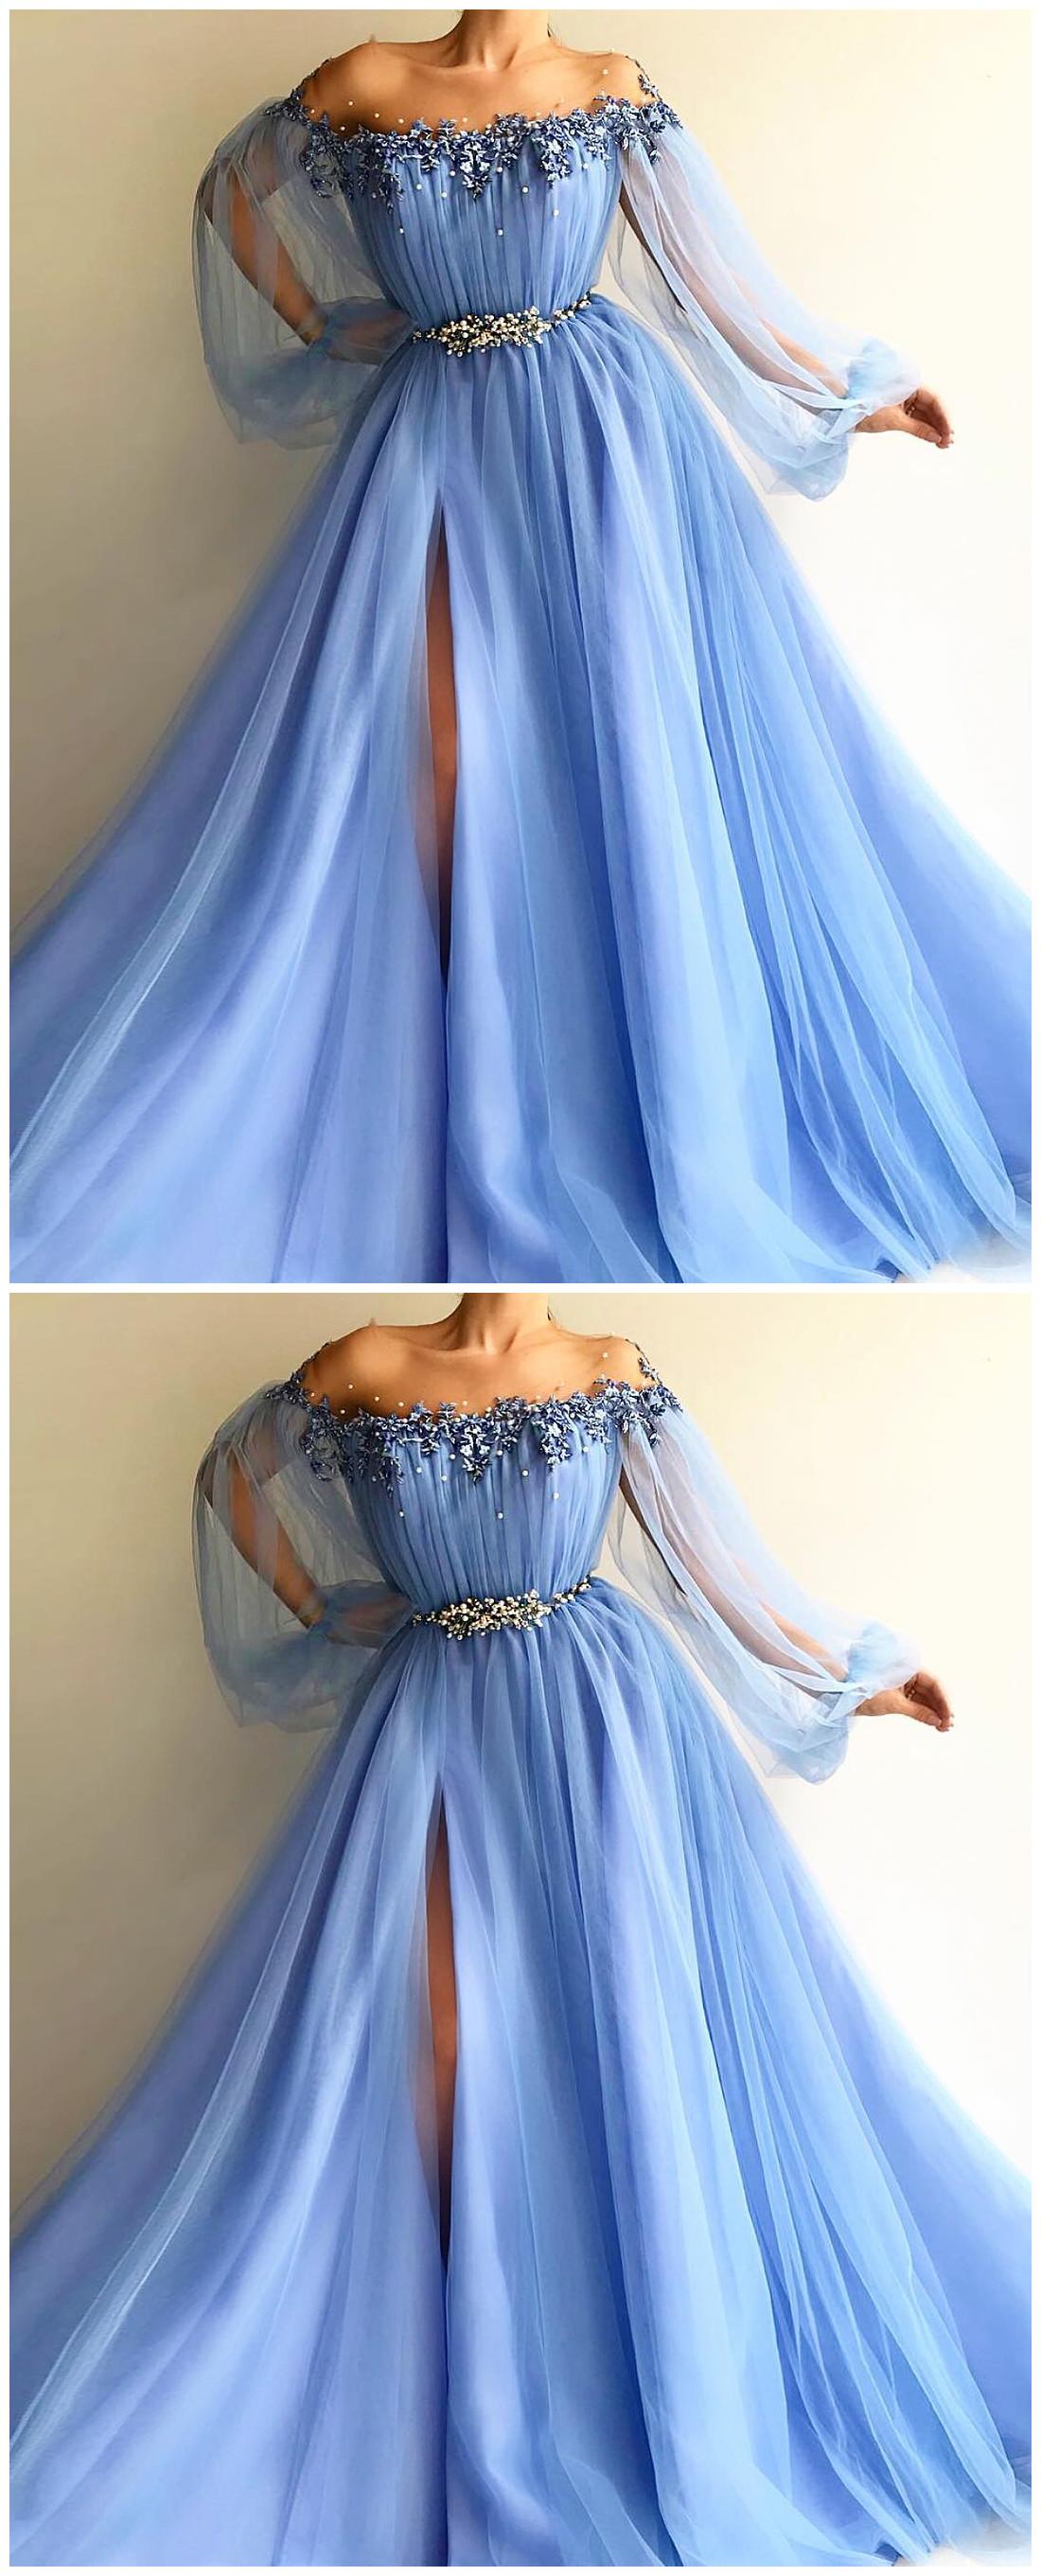 Petite Blue Hot Long Prom Dress Sexy Slit Evening Dress A Line Prom